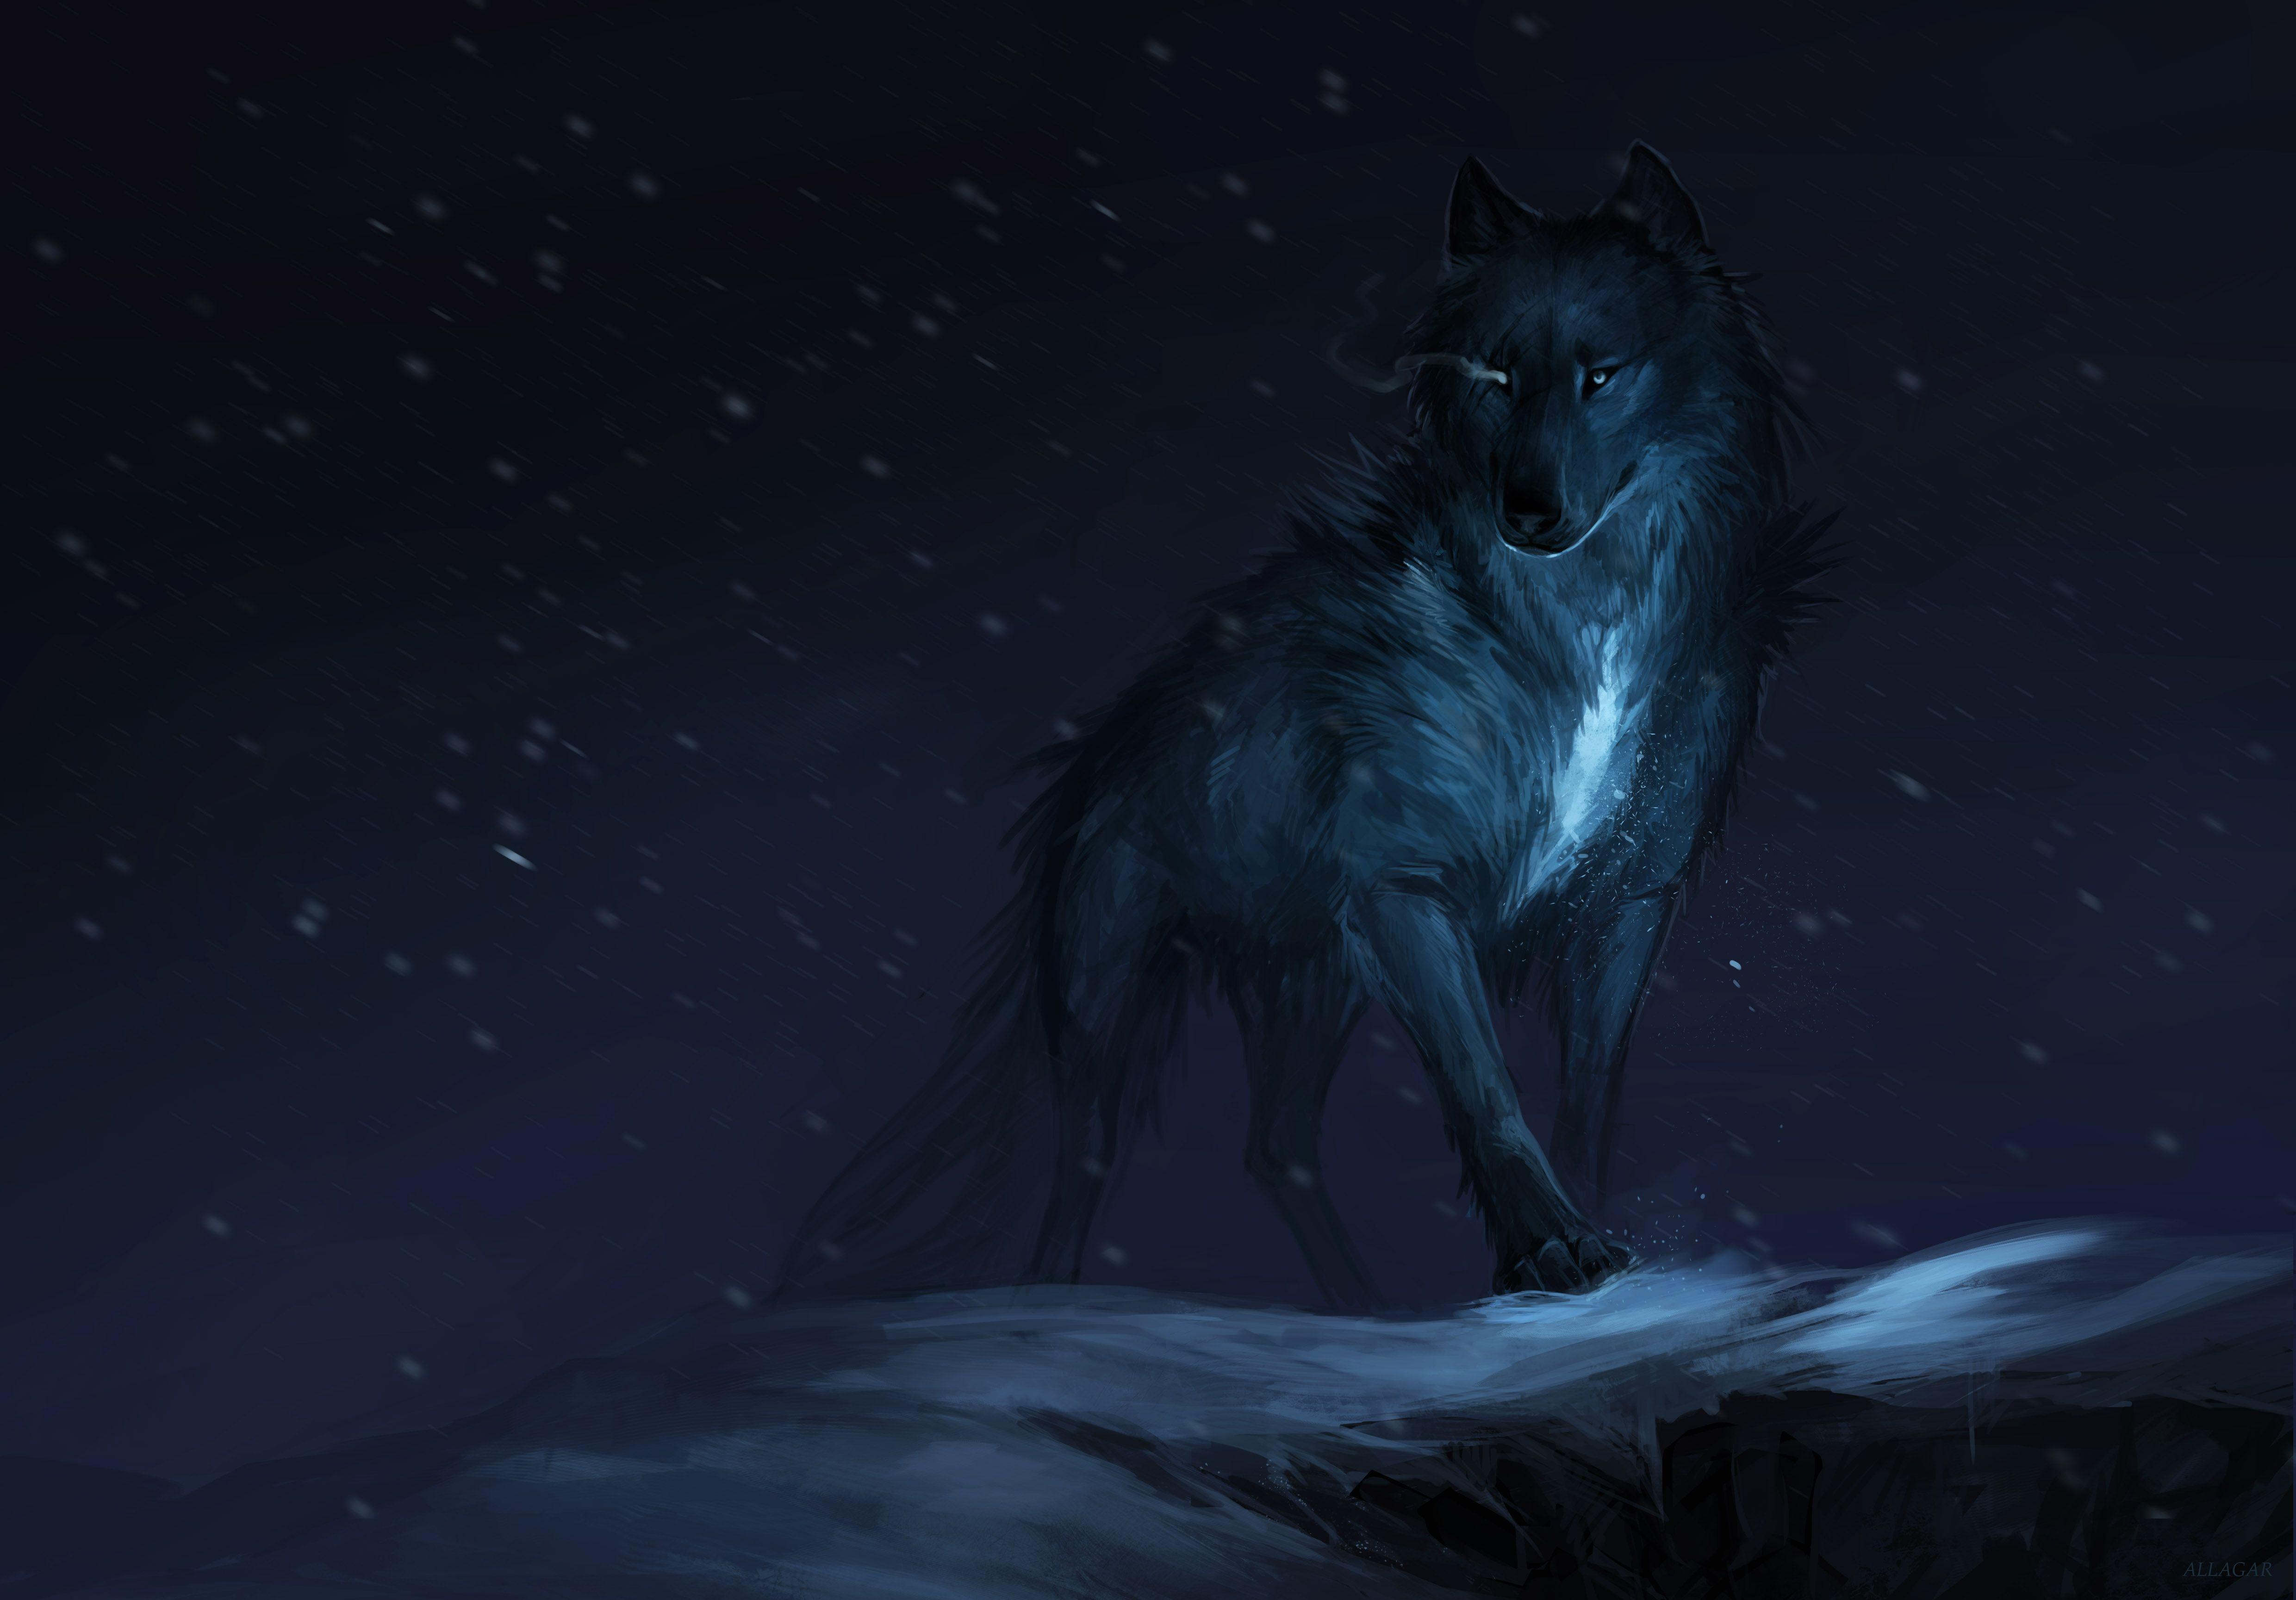 Wolf 4k Desktop Wallpapers - Wallpaper Cave